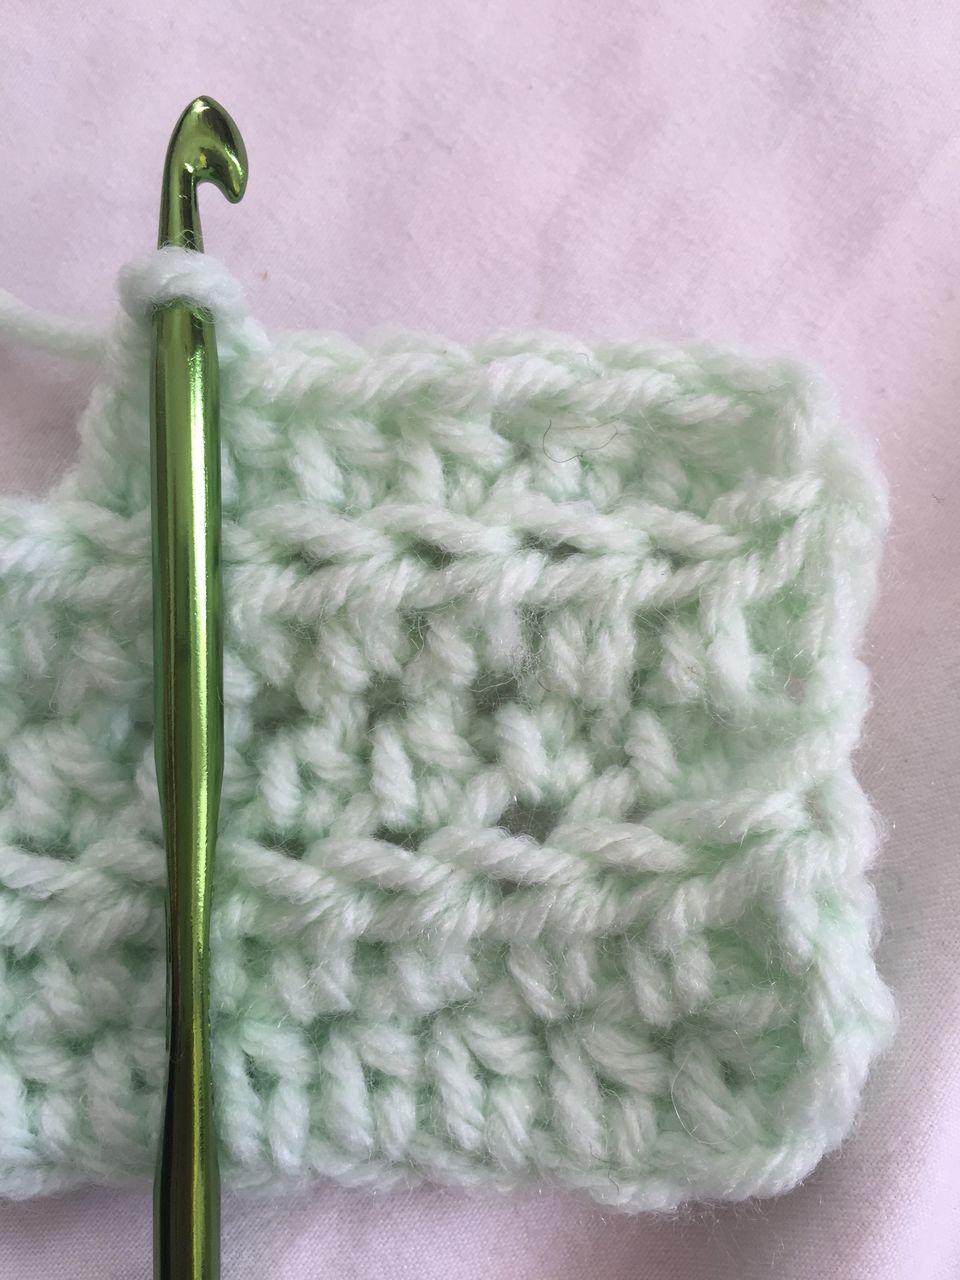 How to Crochet Half Double Crochet Stitch (HDC)